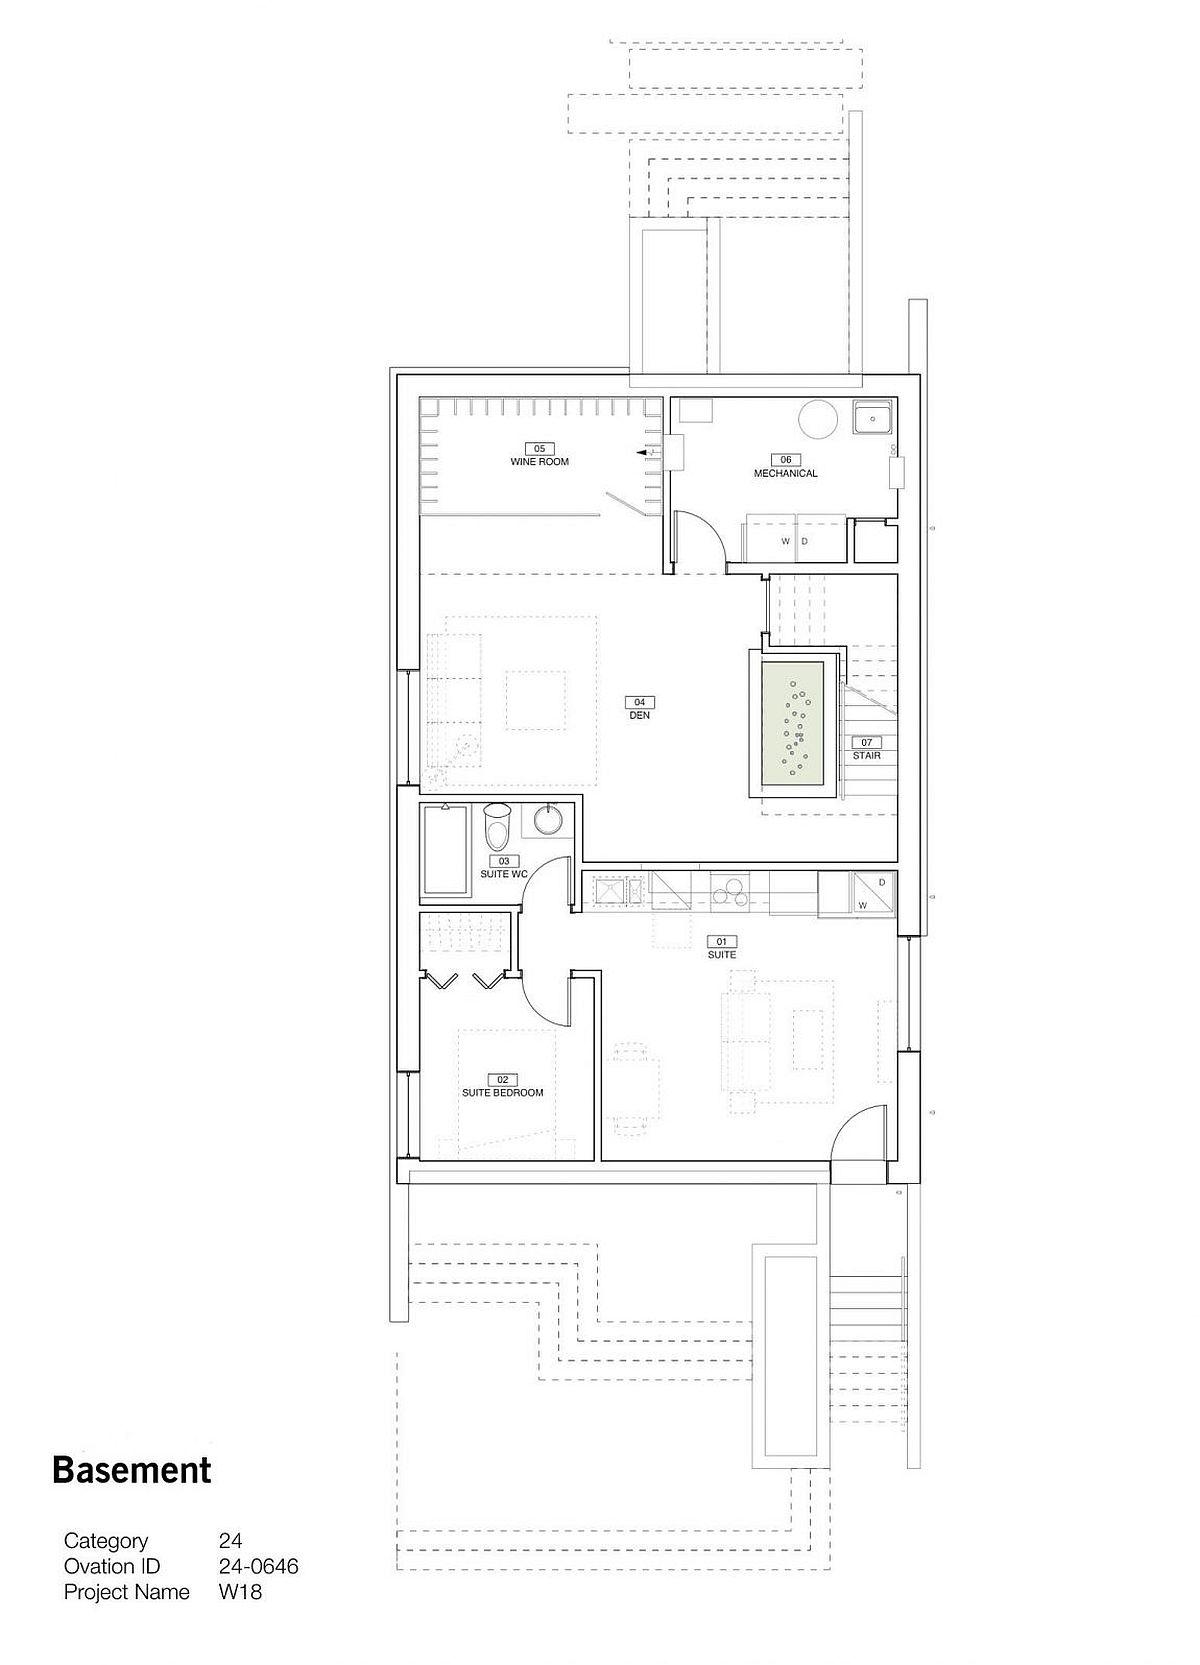 Floor plan of basement level of home in Vancouver